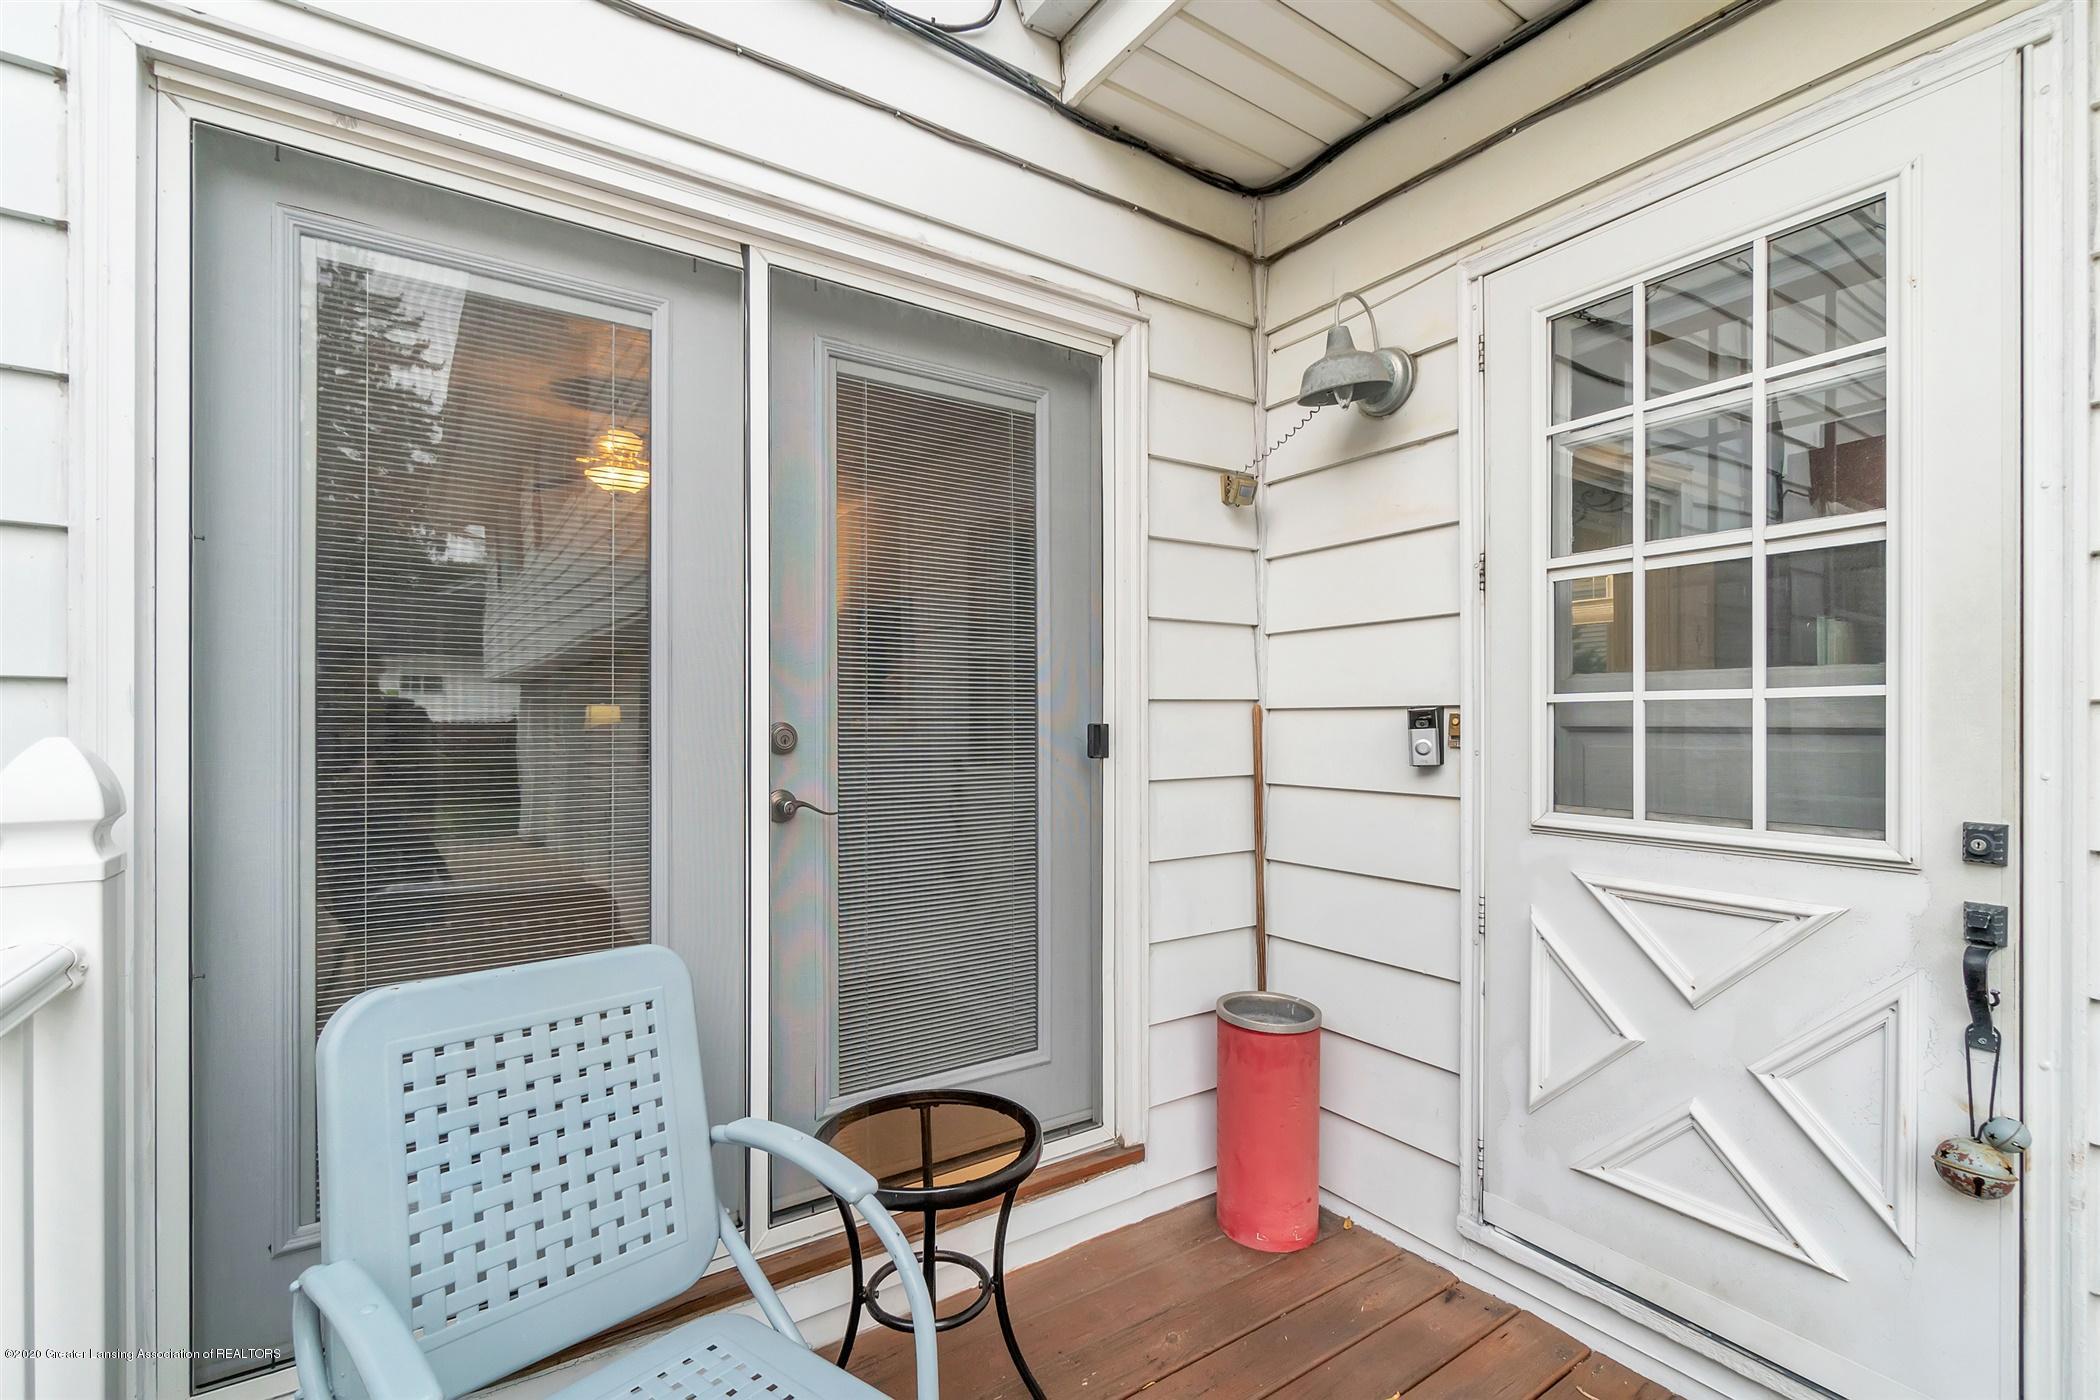 4385 Holt Rd - 64-4385 Holt Rd.-WindowStill-Real-E - 64